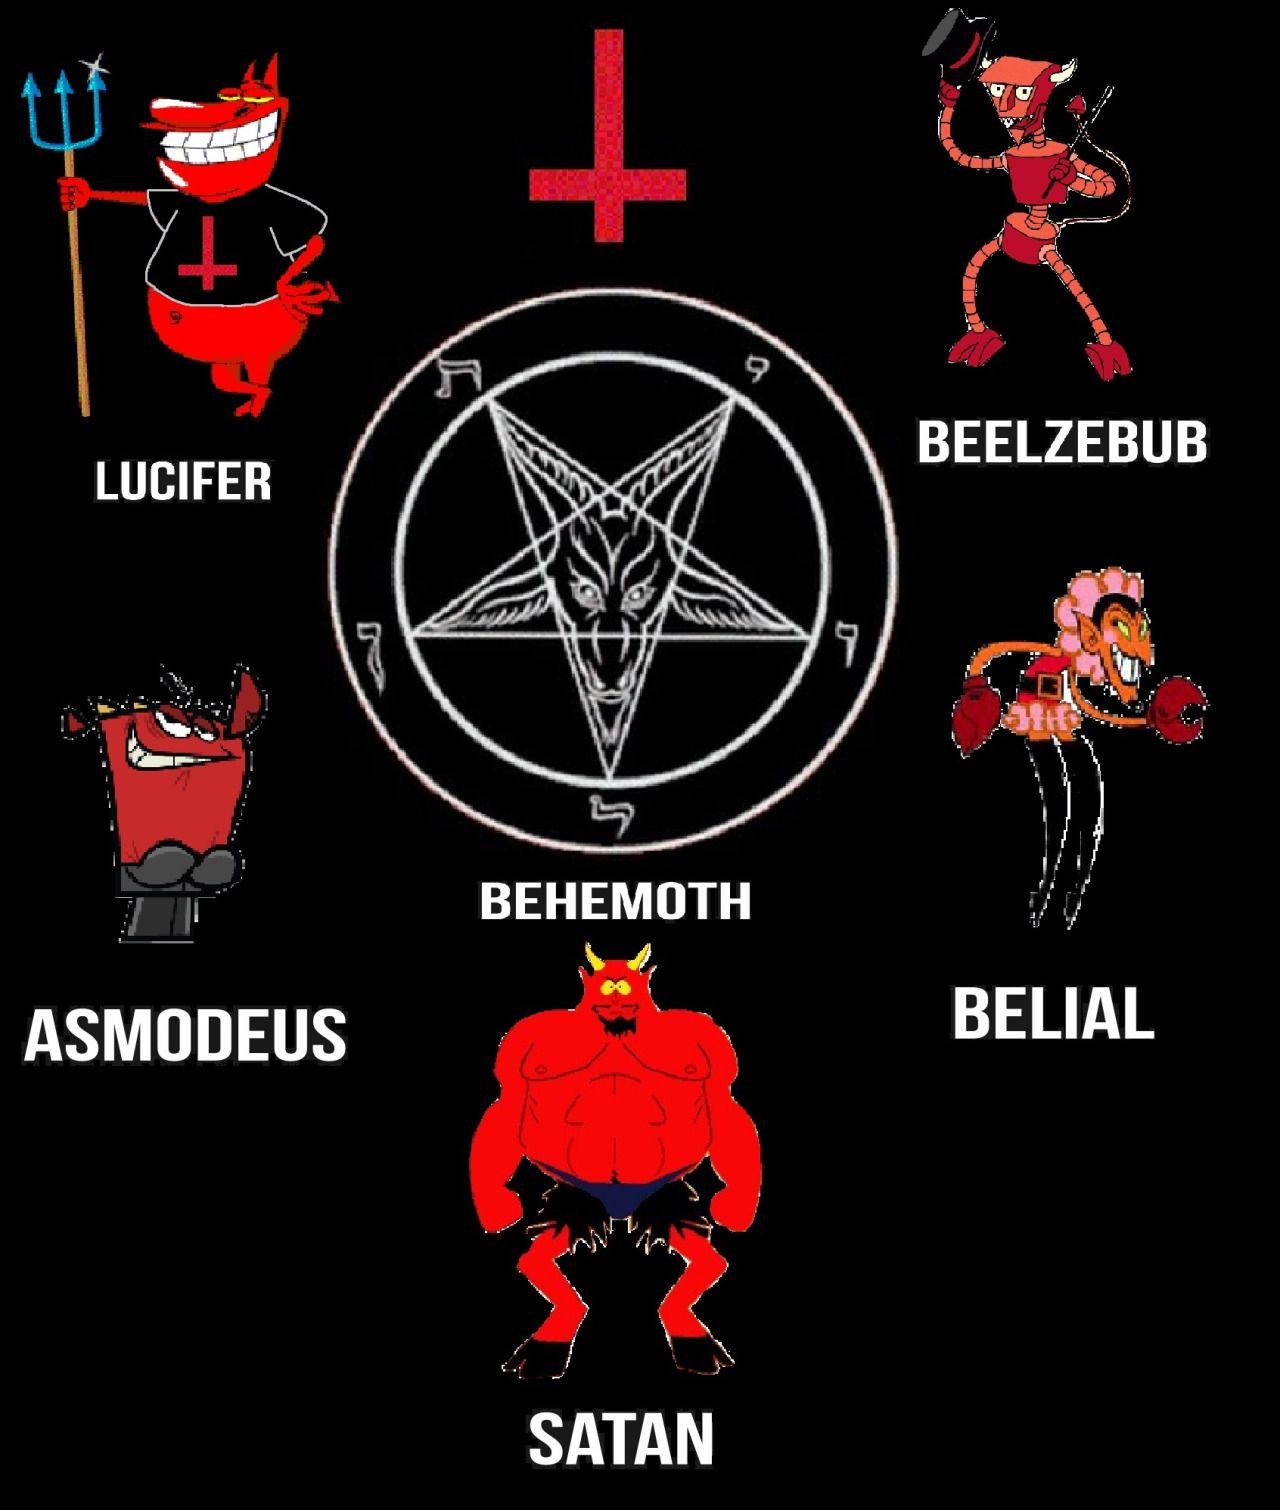 73 666 Satanic Symbols Agenda 2030 Prince William To Become The